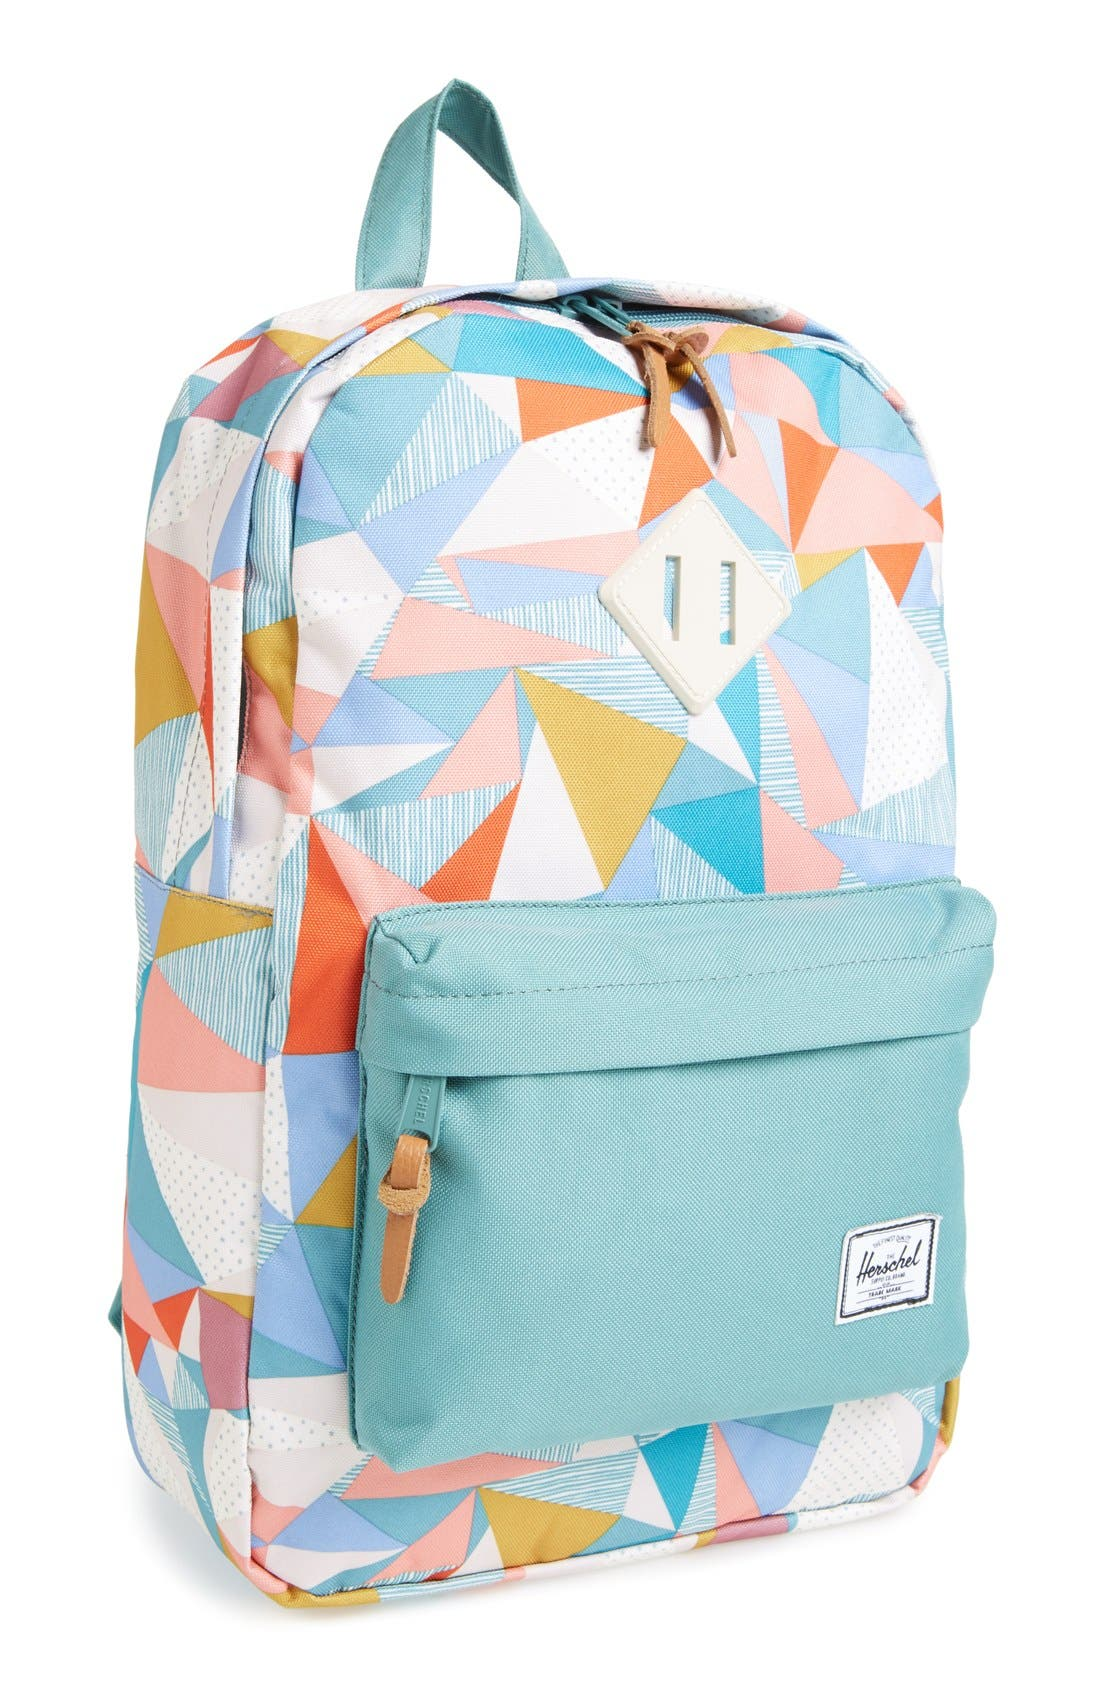 Main Image - Herschel Supply Co. 'Heritage - Medium' Backpack